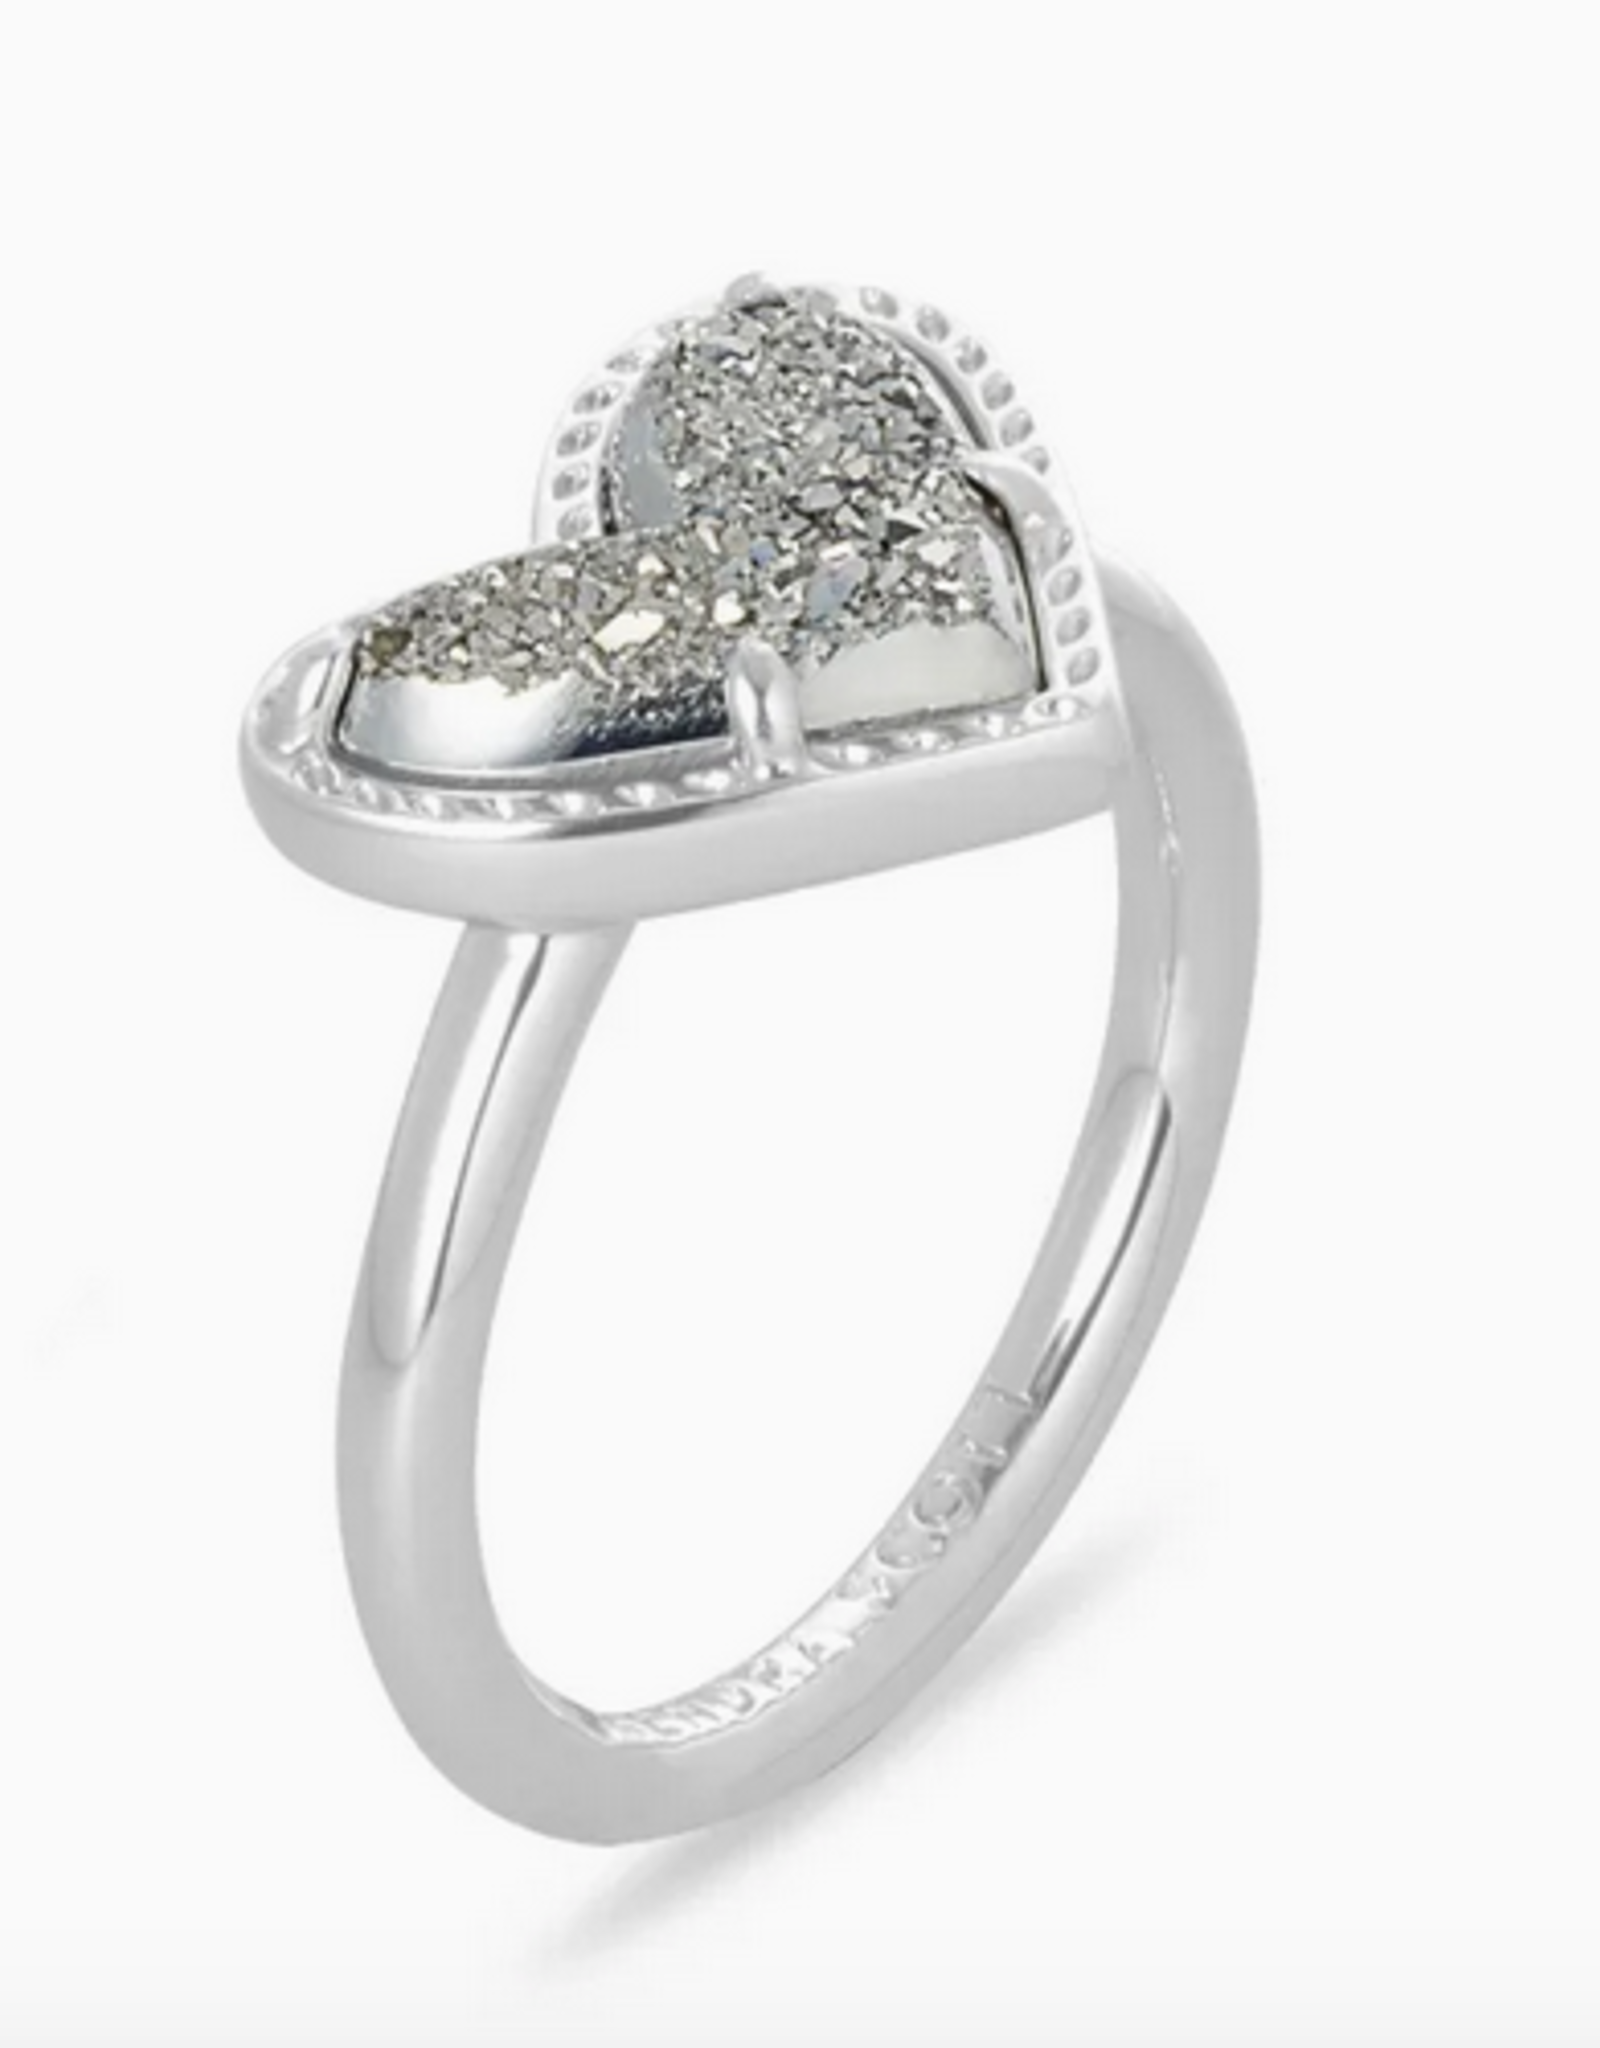 Kendra Scott Kendra Scott Ari Heart Band Ring Rhodium/Platinum Drusy SZ 7